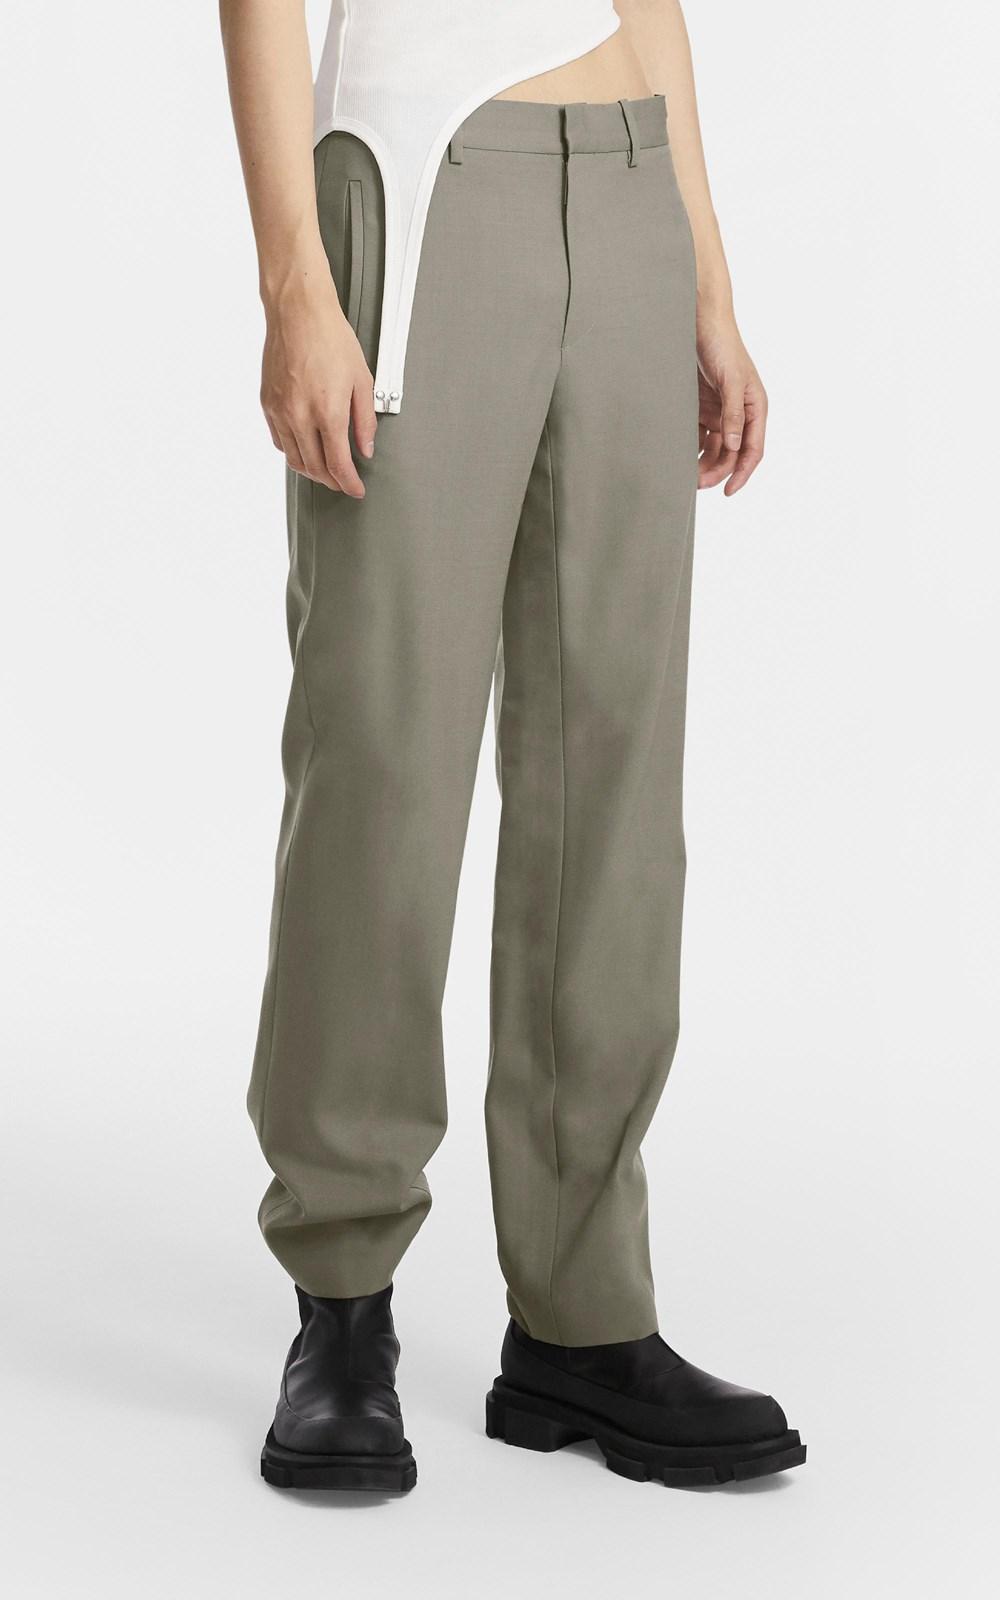 Pants | STRAIGHT PANT